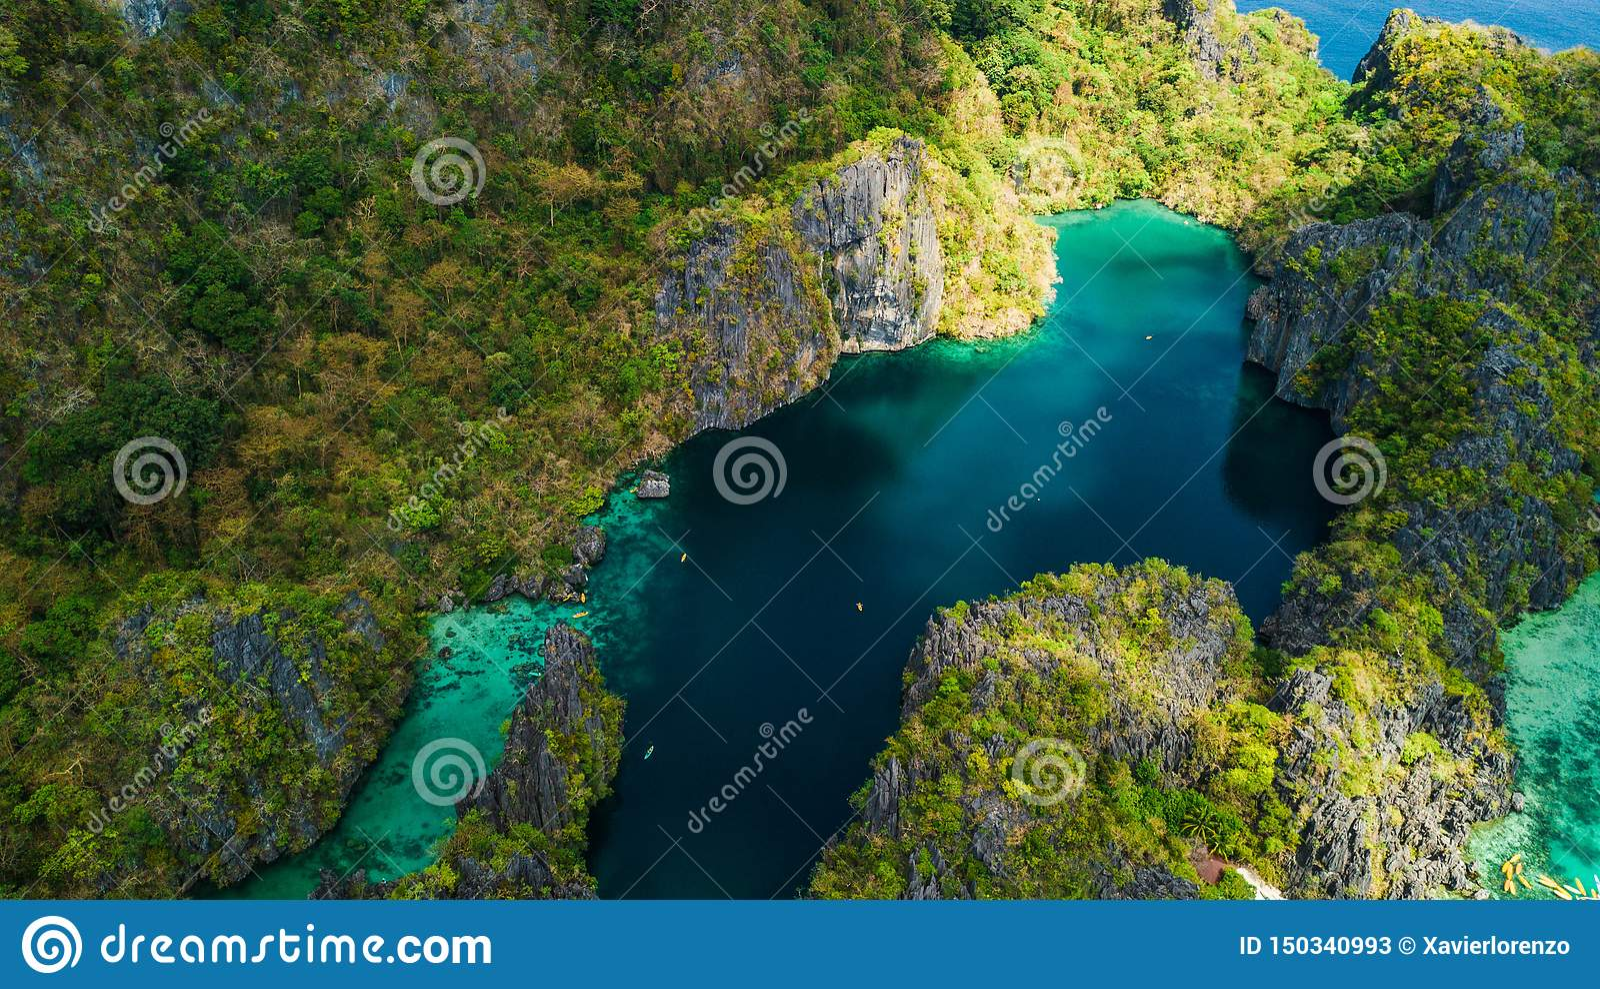 Aerial View Of Big Lagoon In El Nido Palawan The